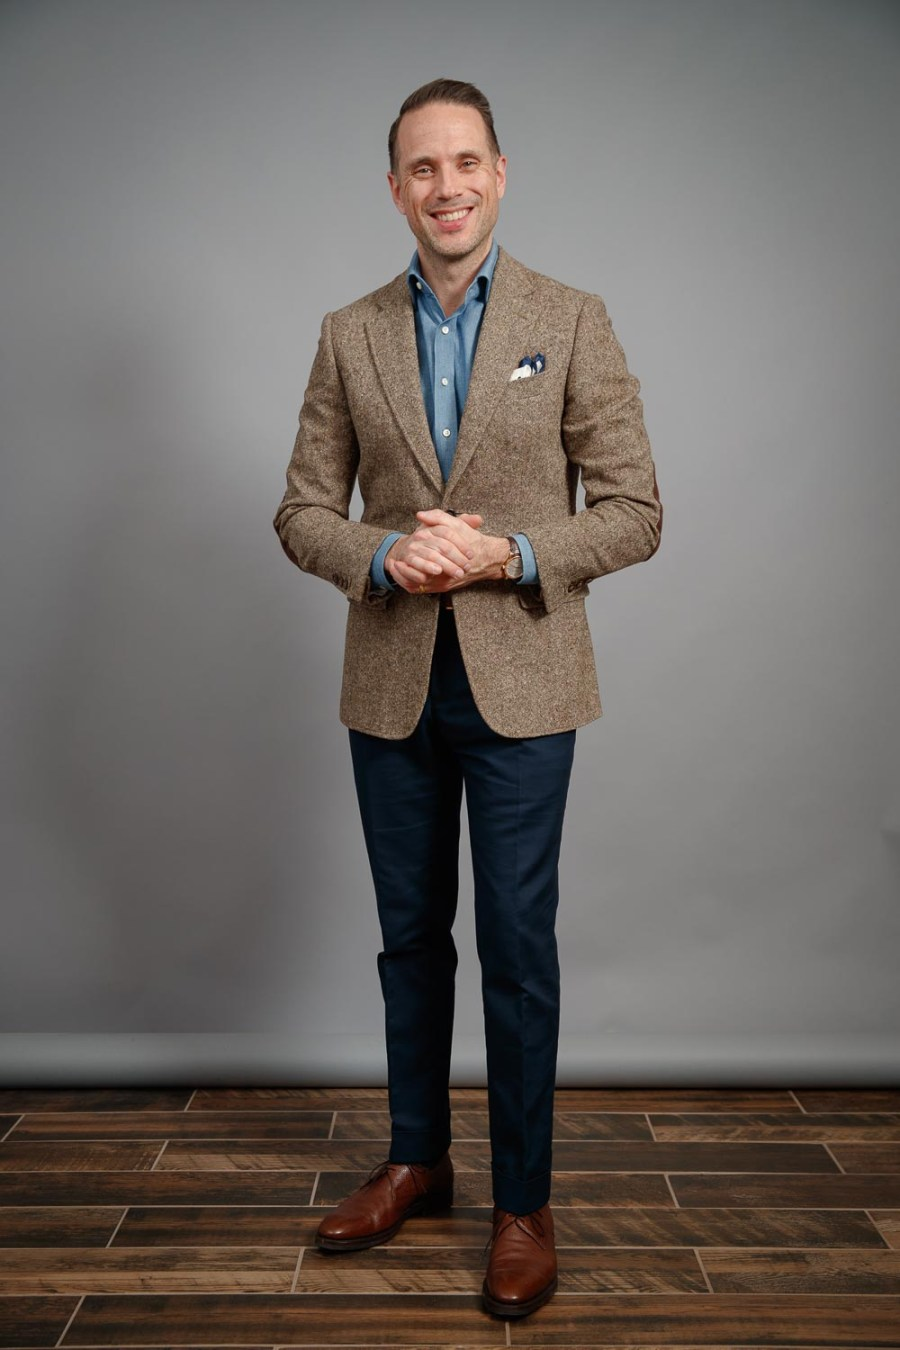 mens-denim-shirt-2021-brown-donegal-tweed-jacket-navy-chinos-for-spring